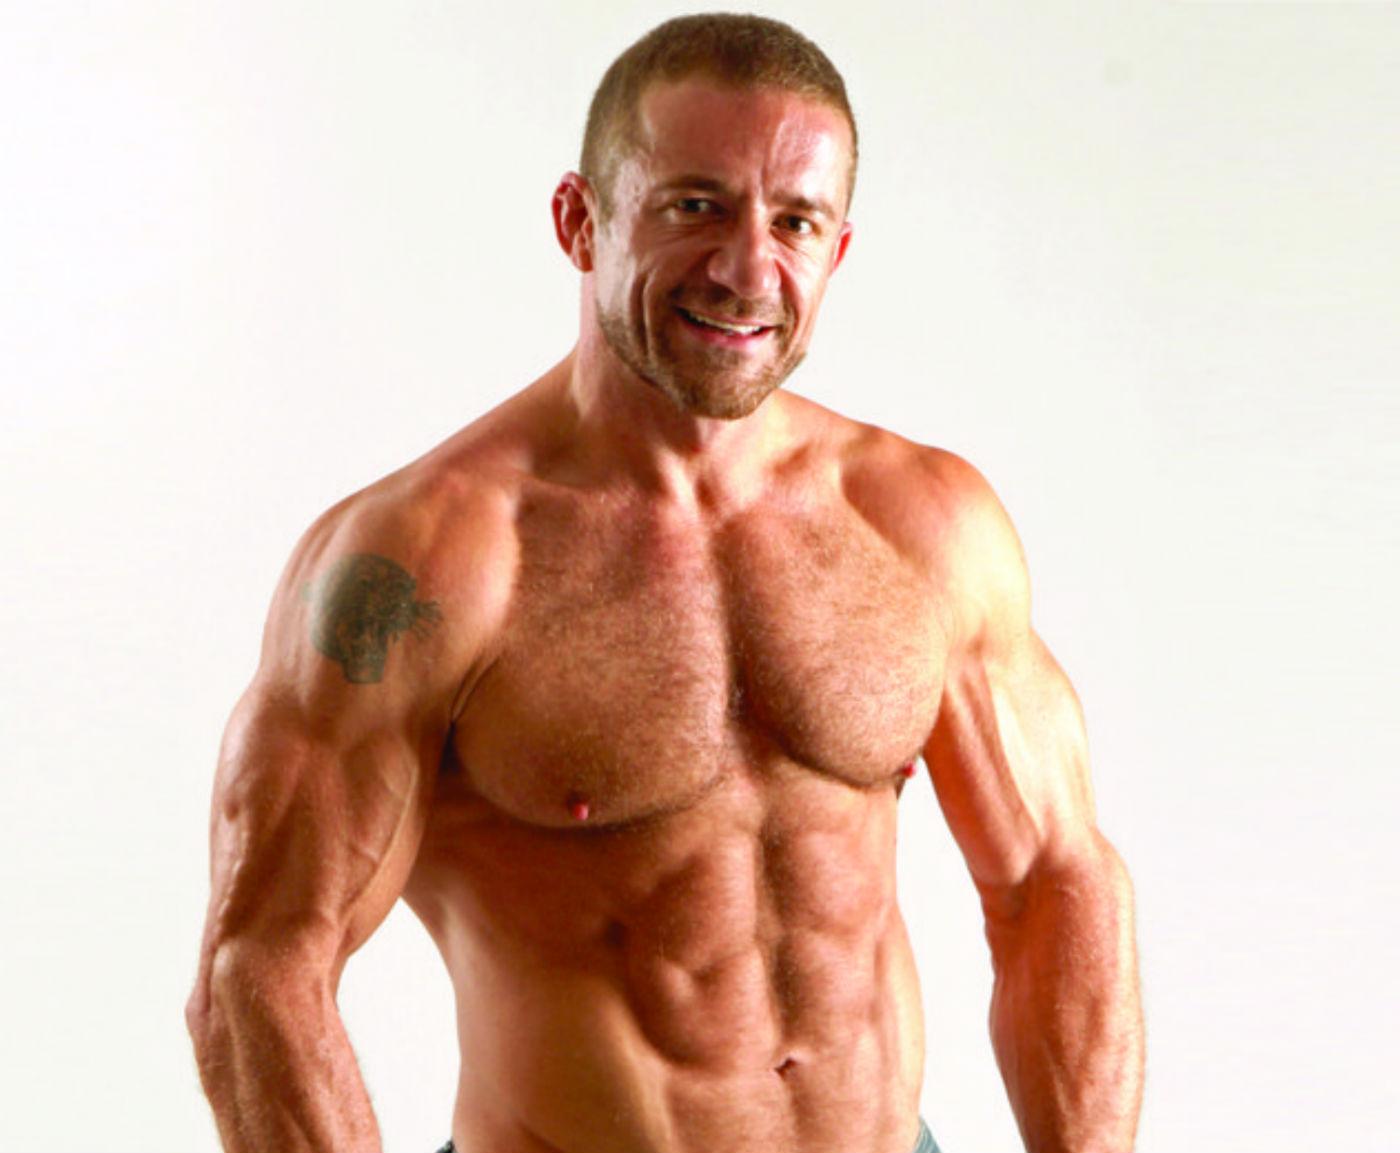 Donald gay bodybuilder